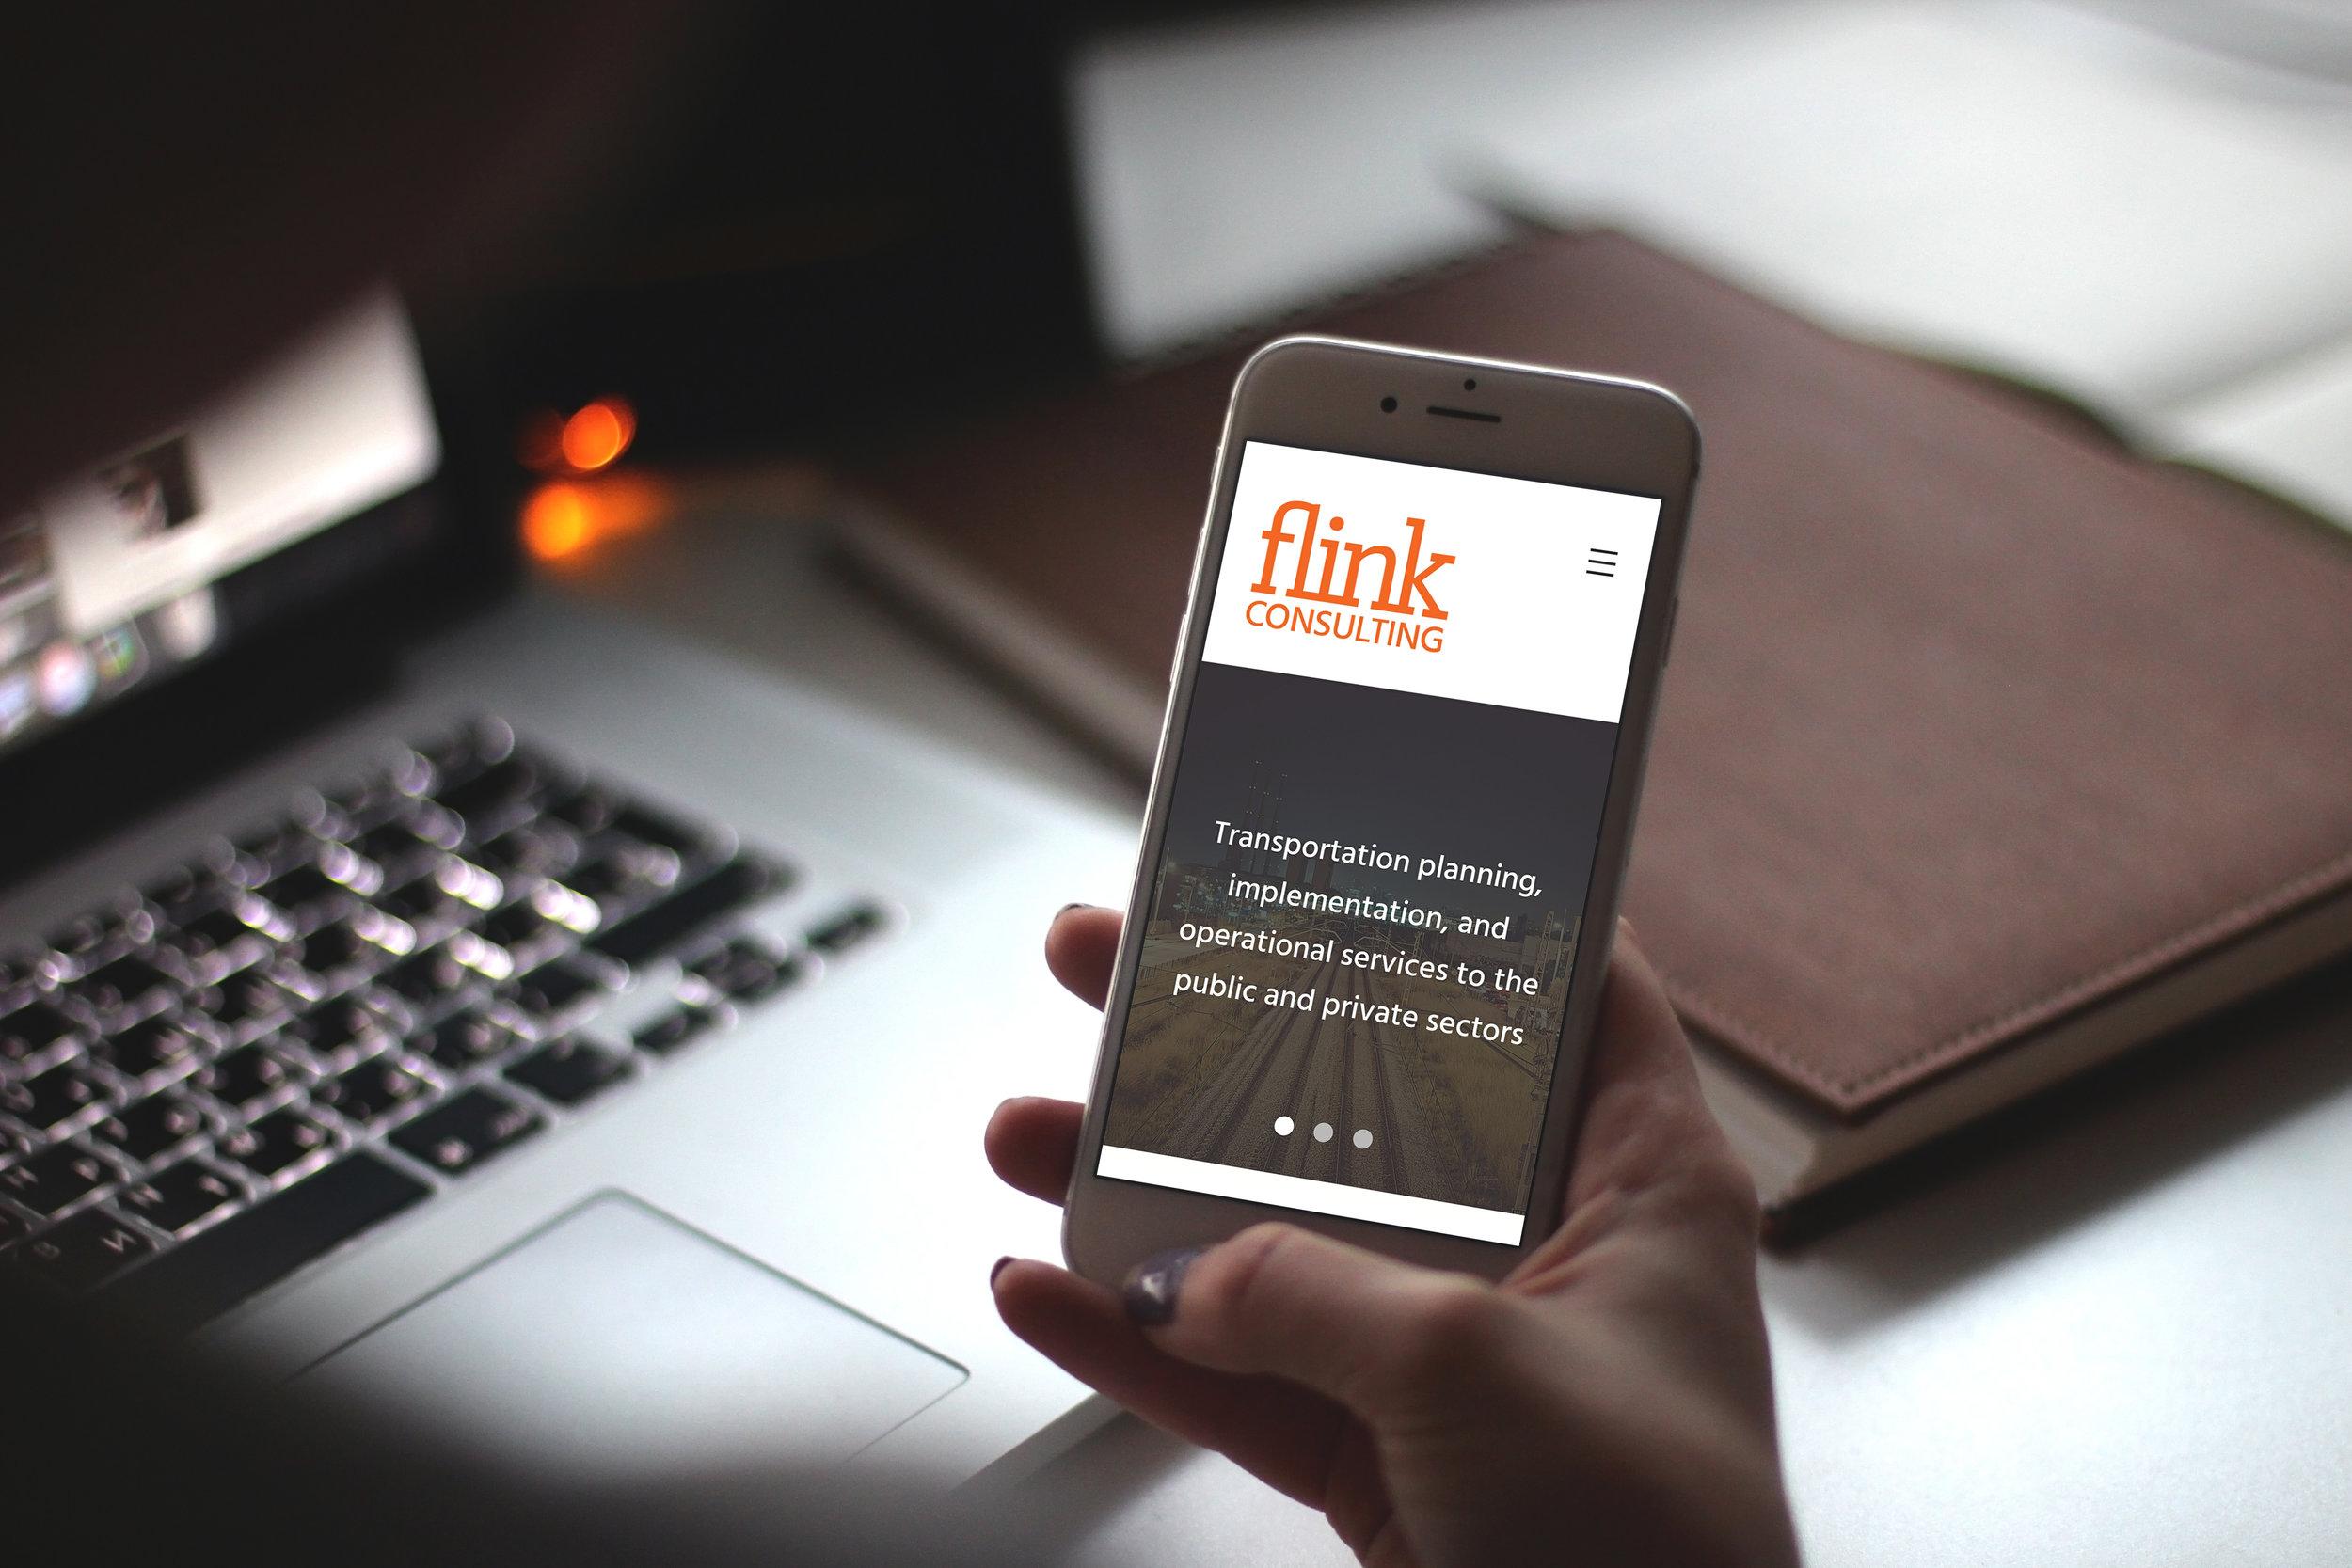 Flink_Mobile_Site.jpg